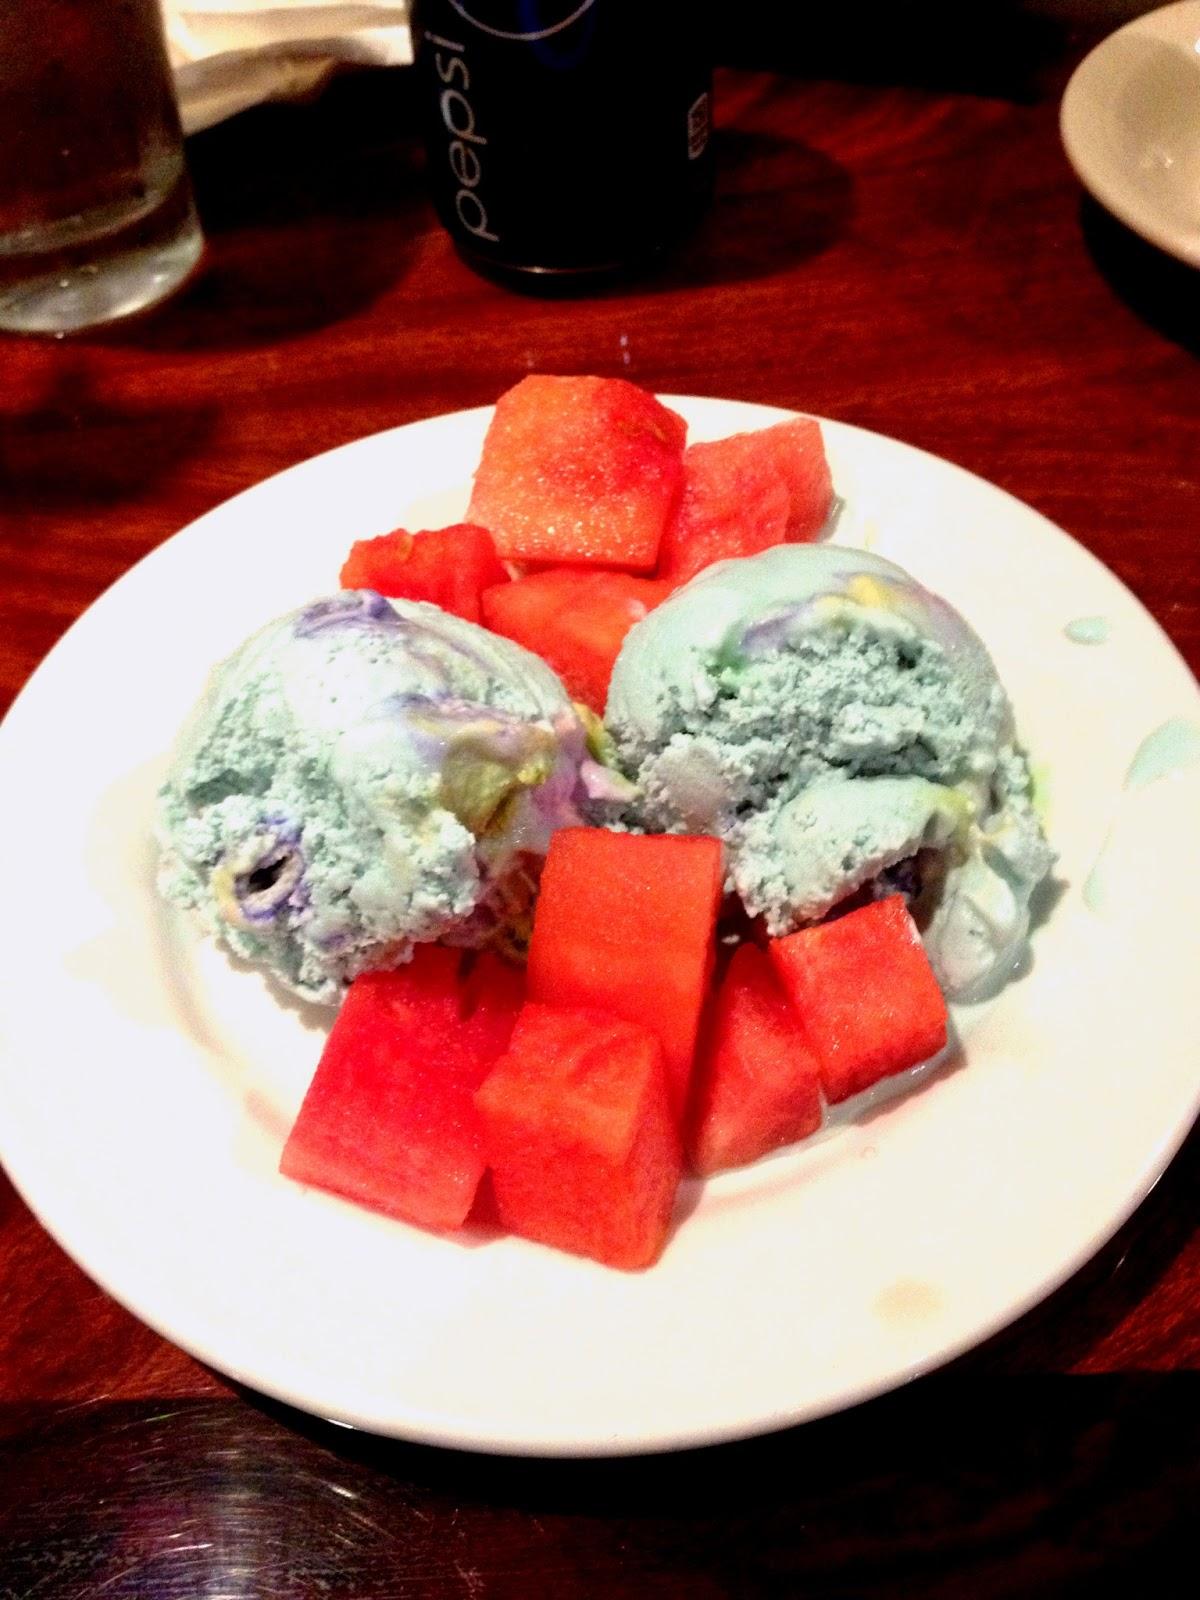 Mystery Ice Cream (Bubblegum flavor), and watermelon